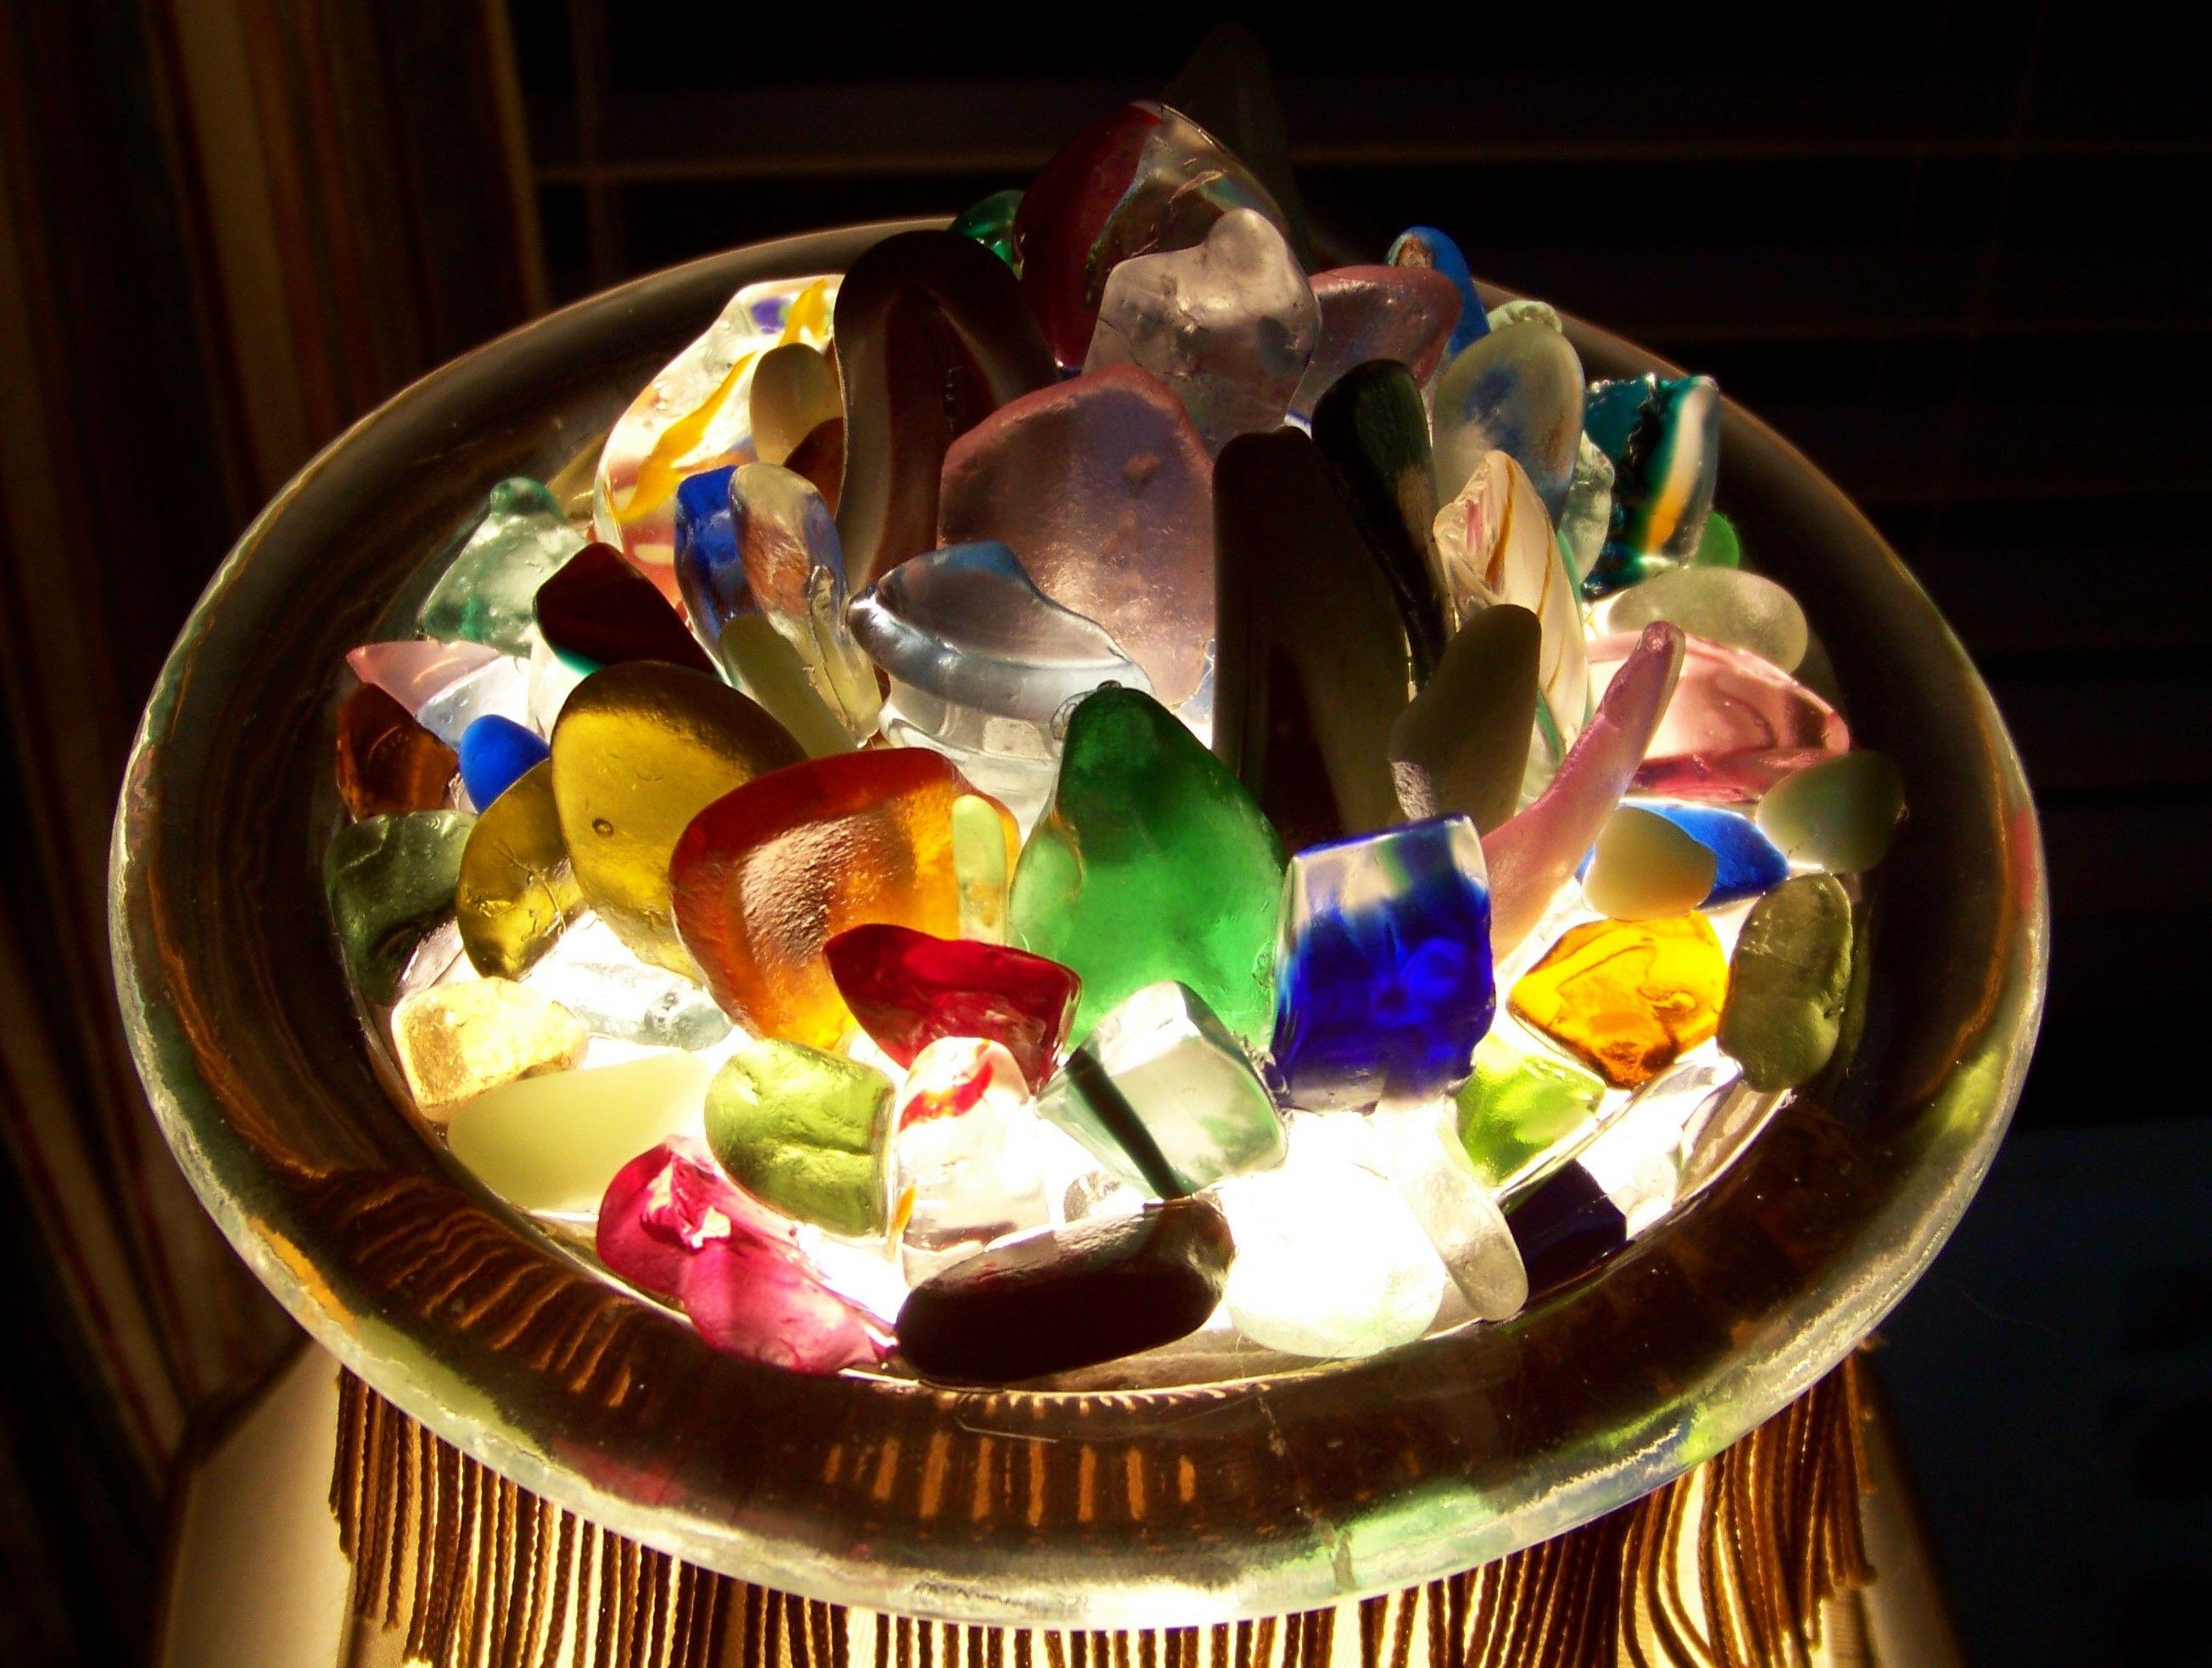 Sea glass on glass round.